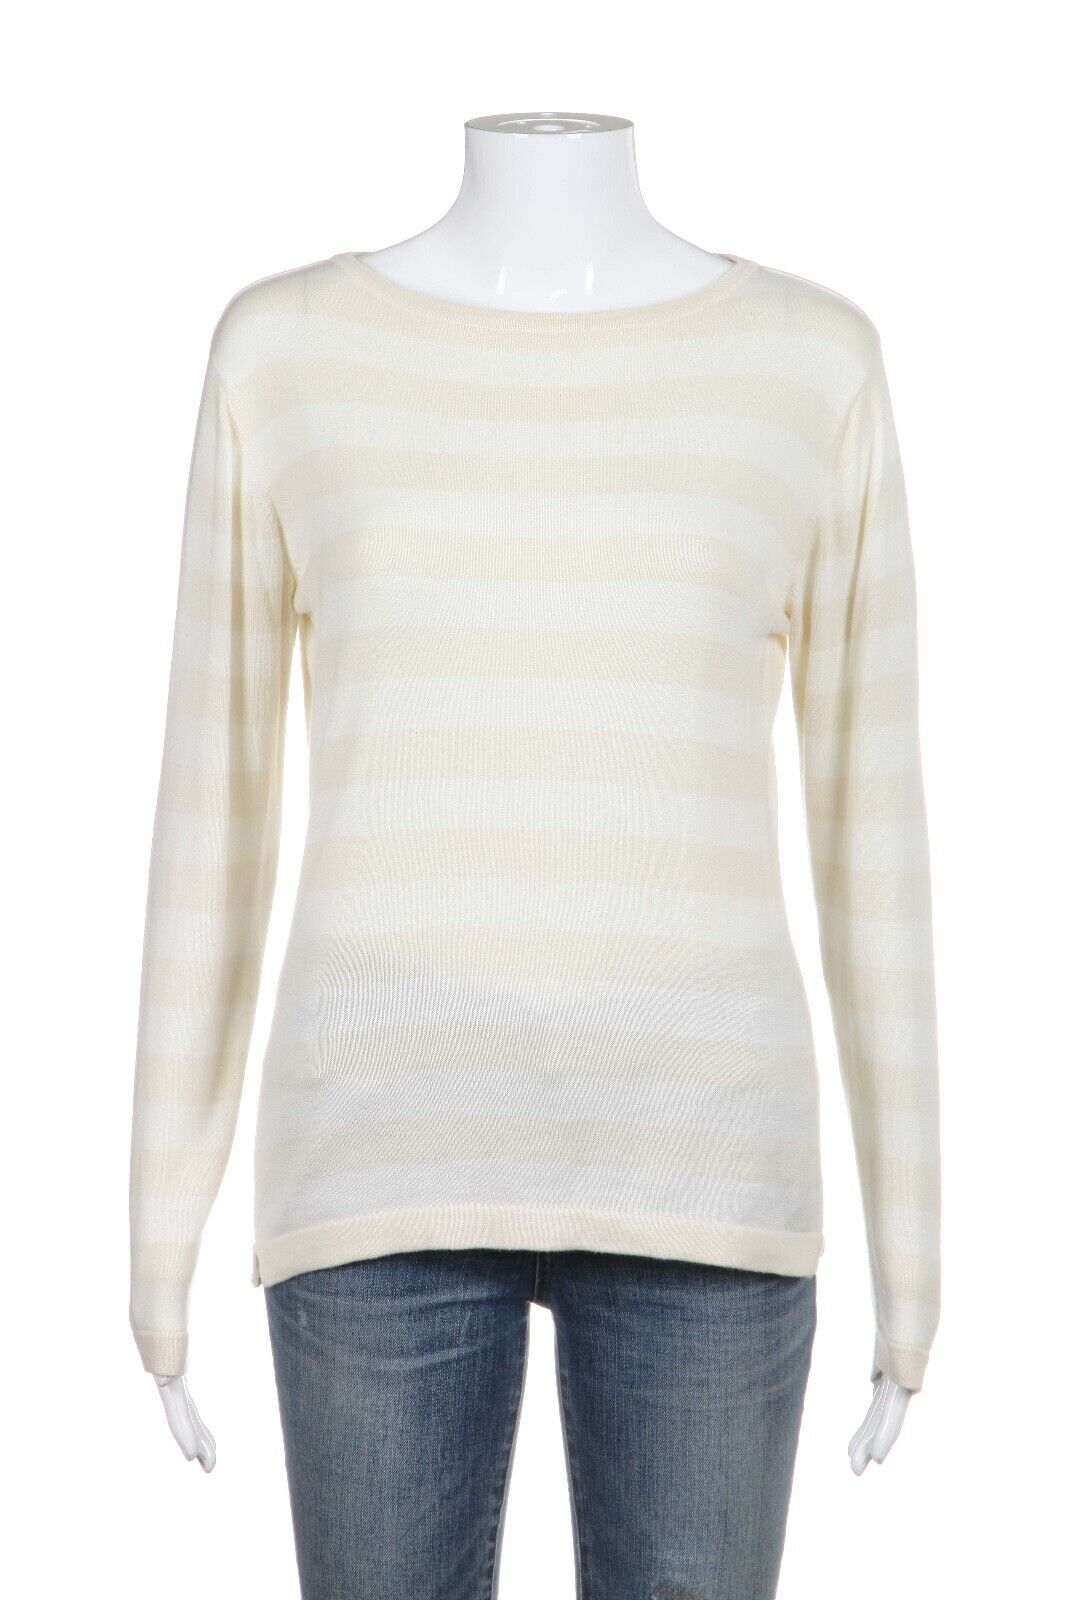 DEBRA C BEVERLY HILLS Sweater Top Medium 100% Cotton Cream White Striped